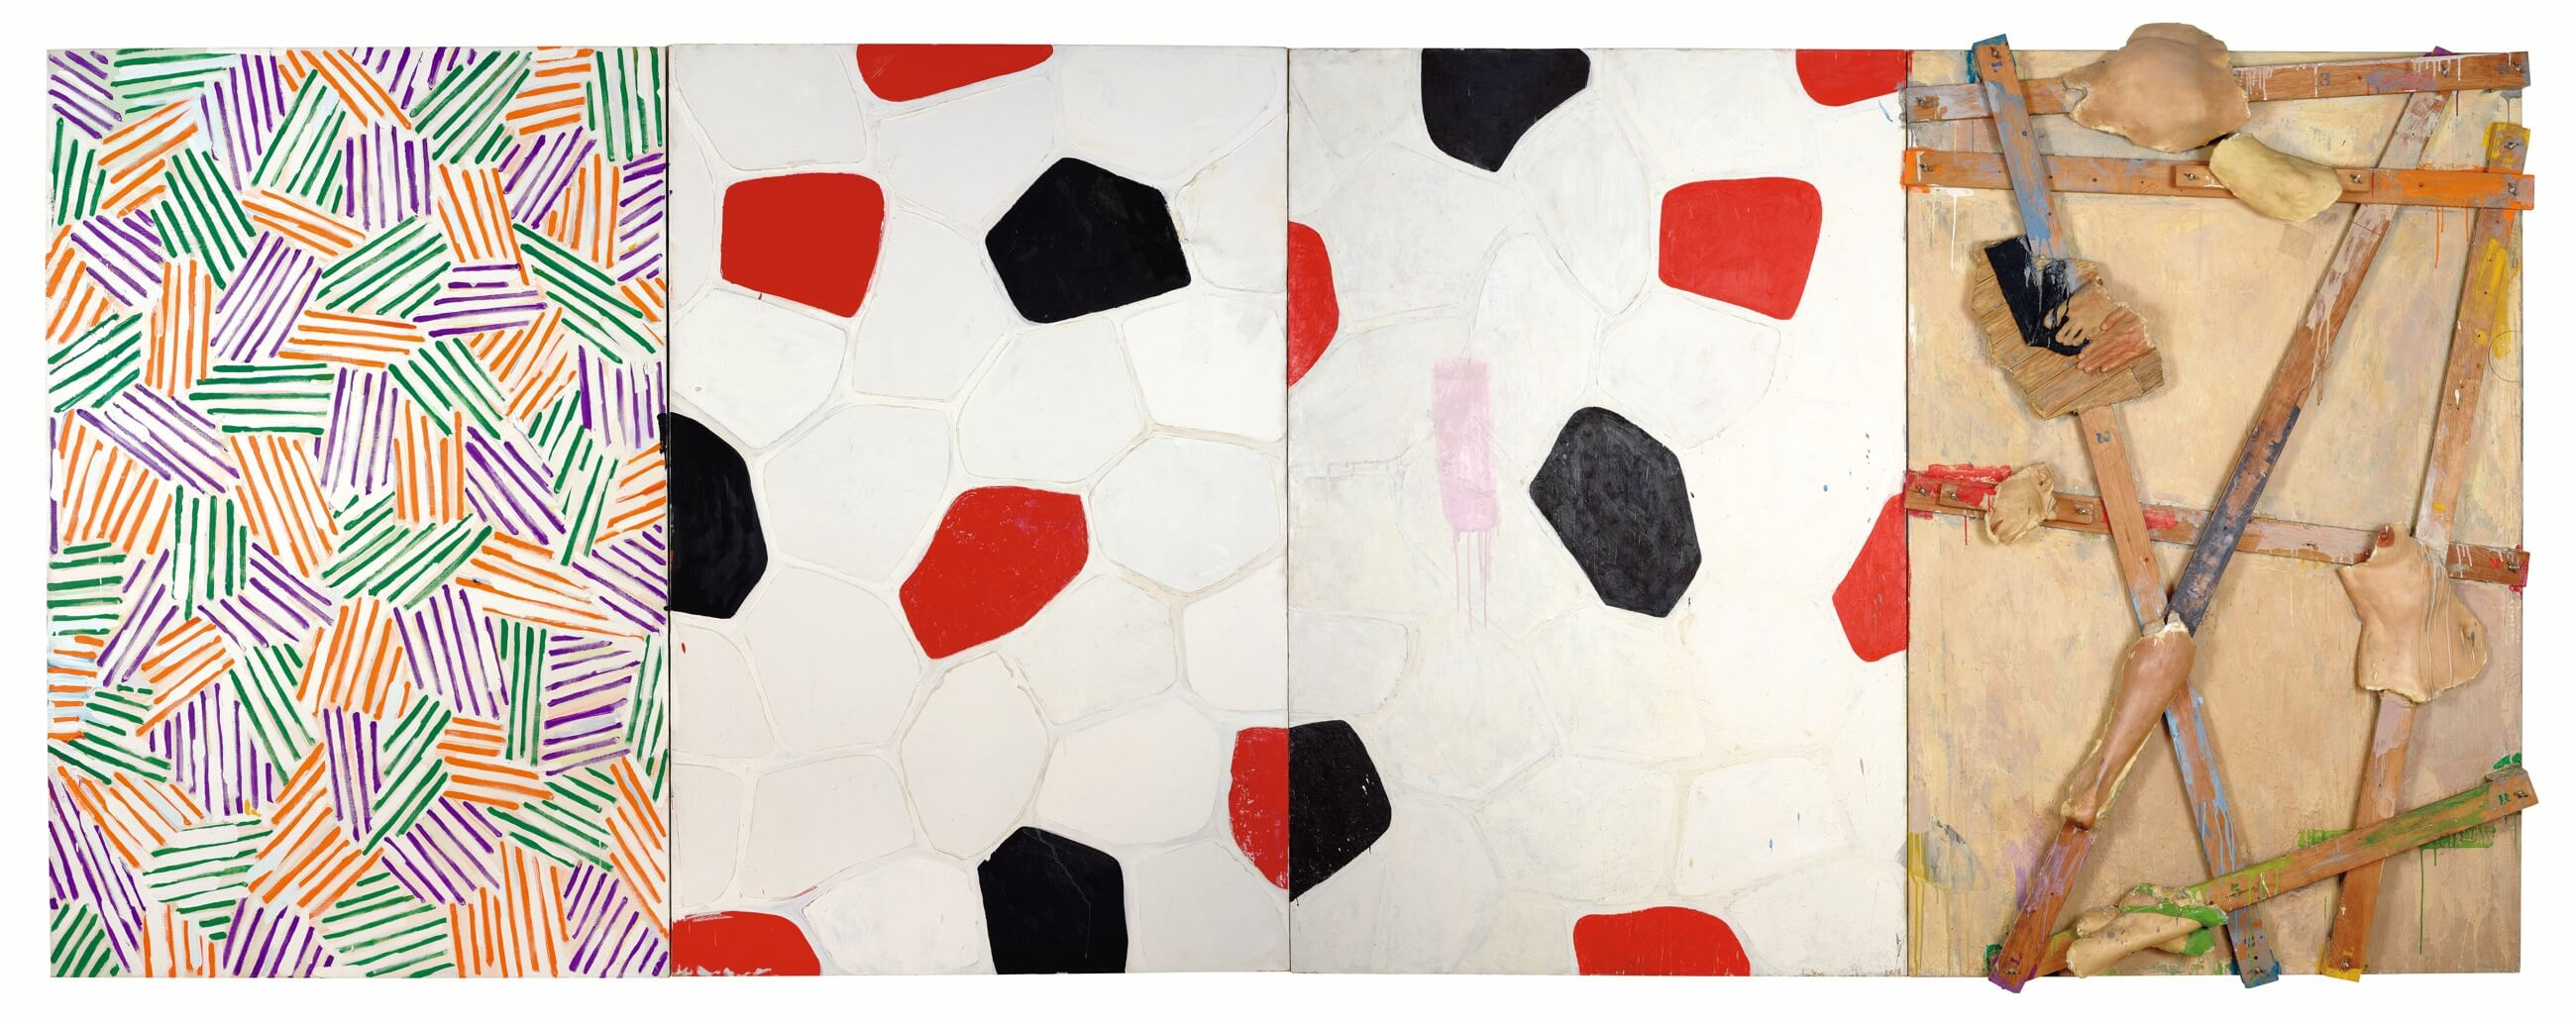 Untitled, 1972, by Jasper Johns